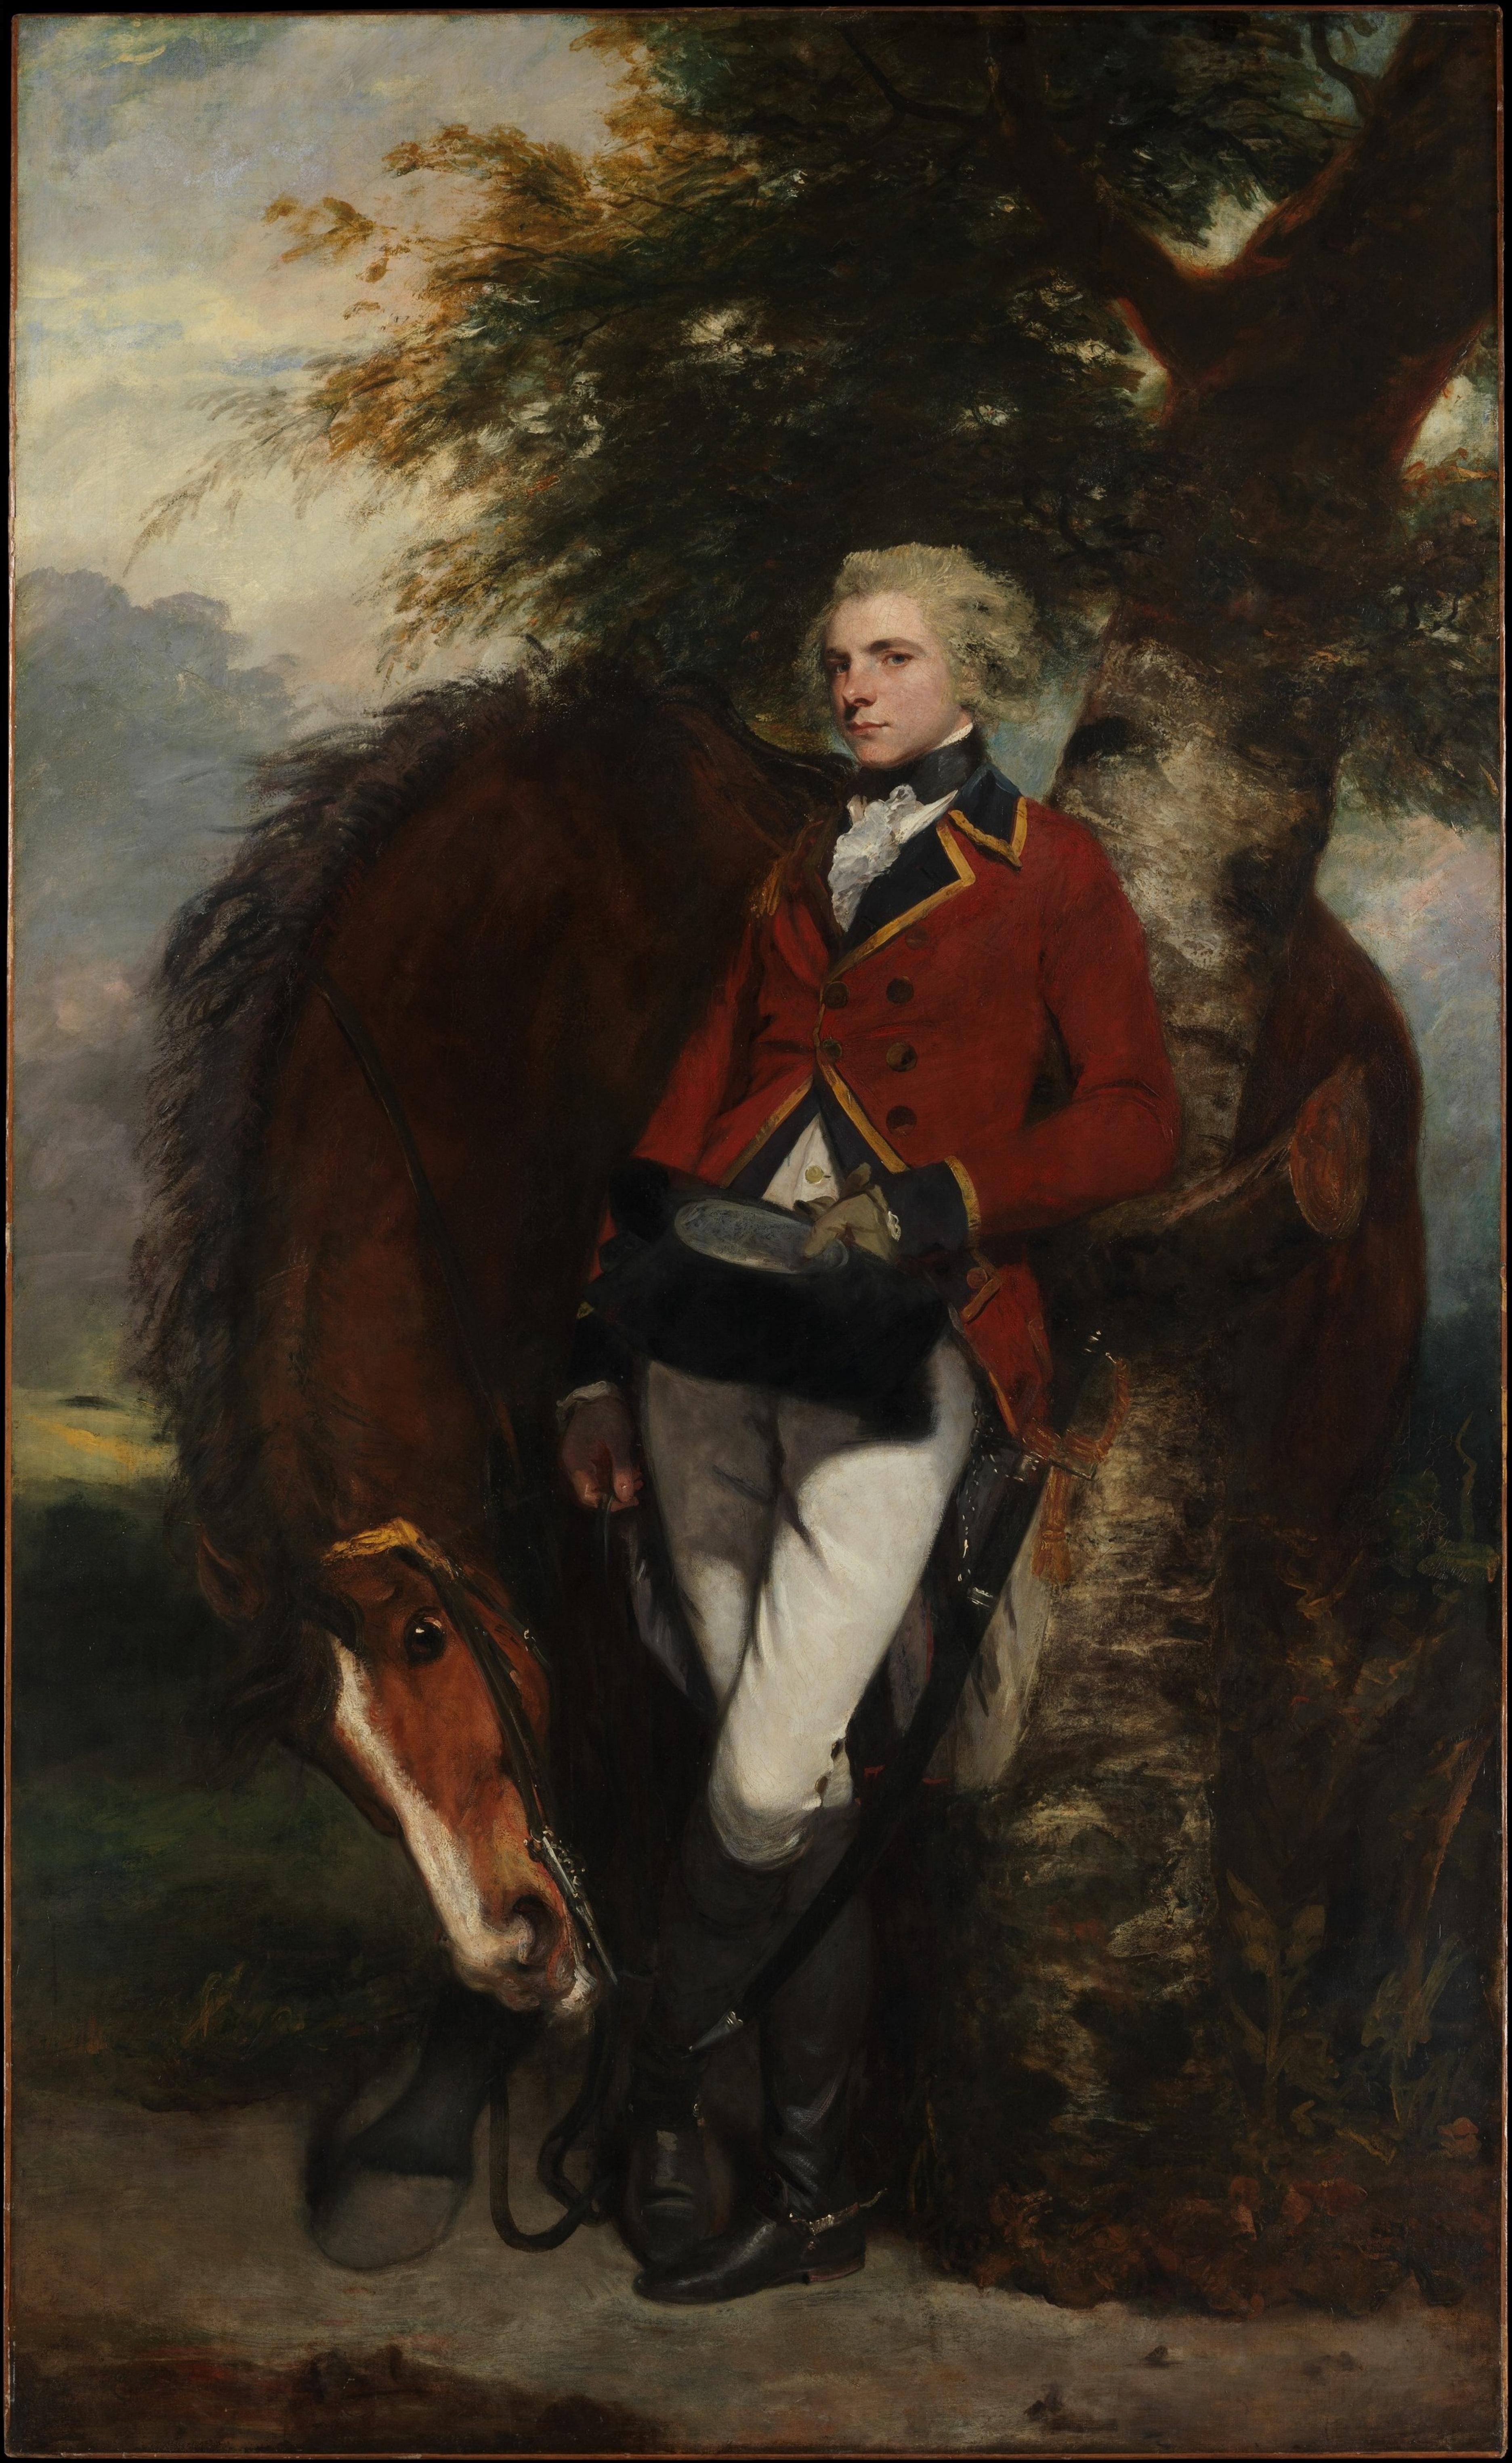 Joshua Reynolds – Captain George K. H. Coussmaker [3744×6098]